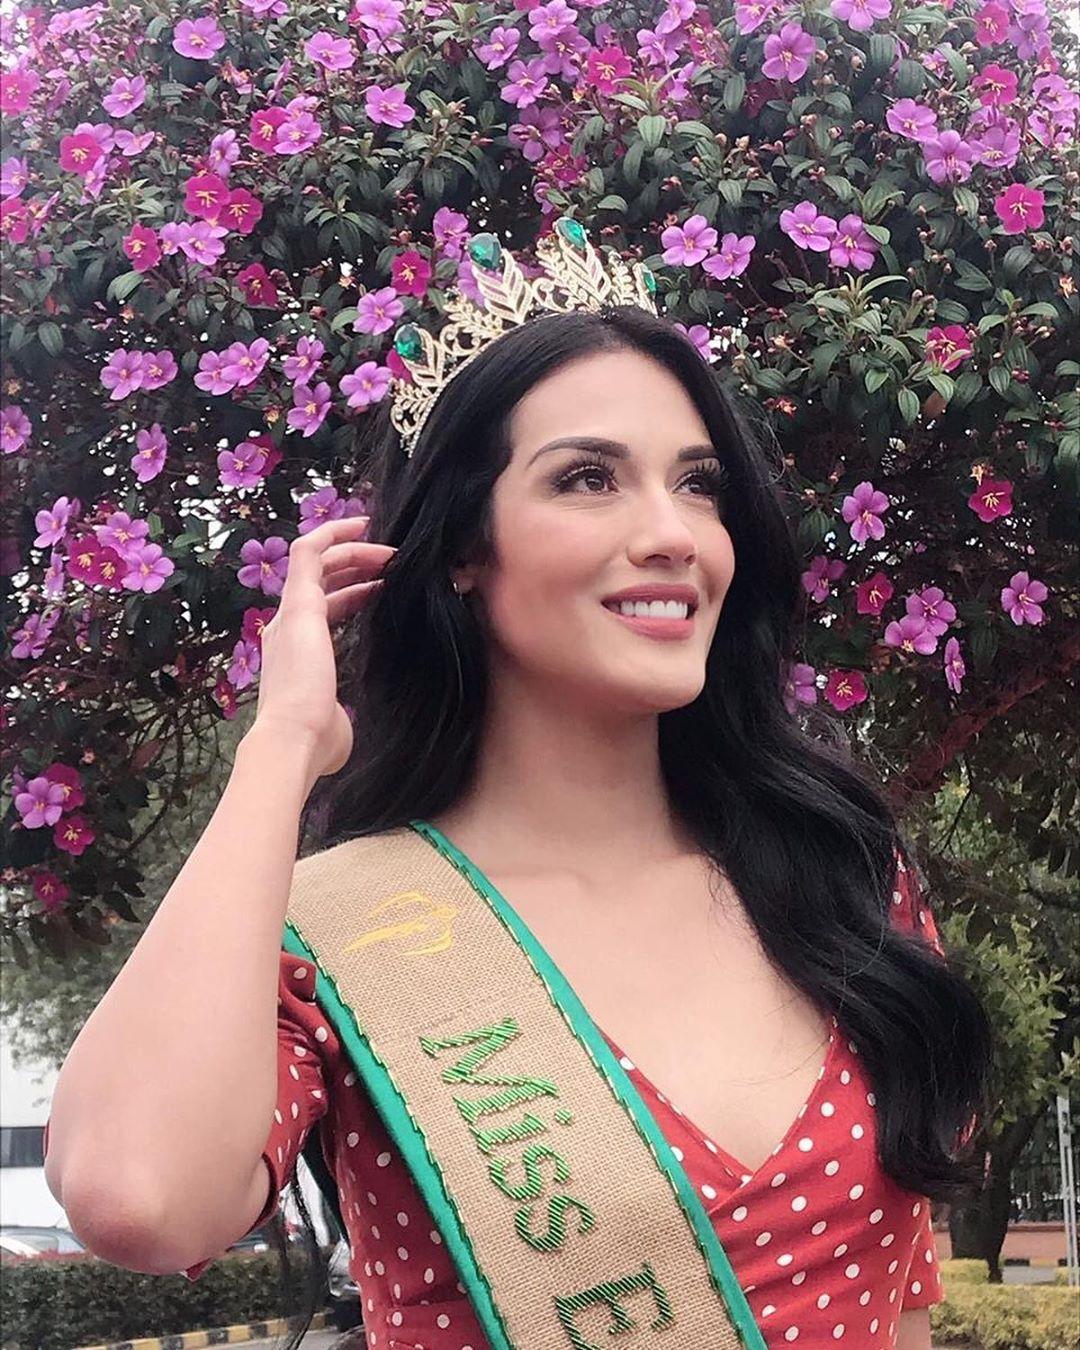 yenny katherine carrillo, top 20 de miss earth 2019/reyna mundial banano 2017. - Página 4 69490710